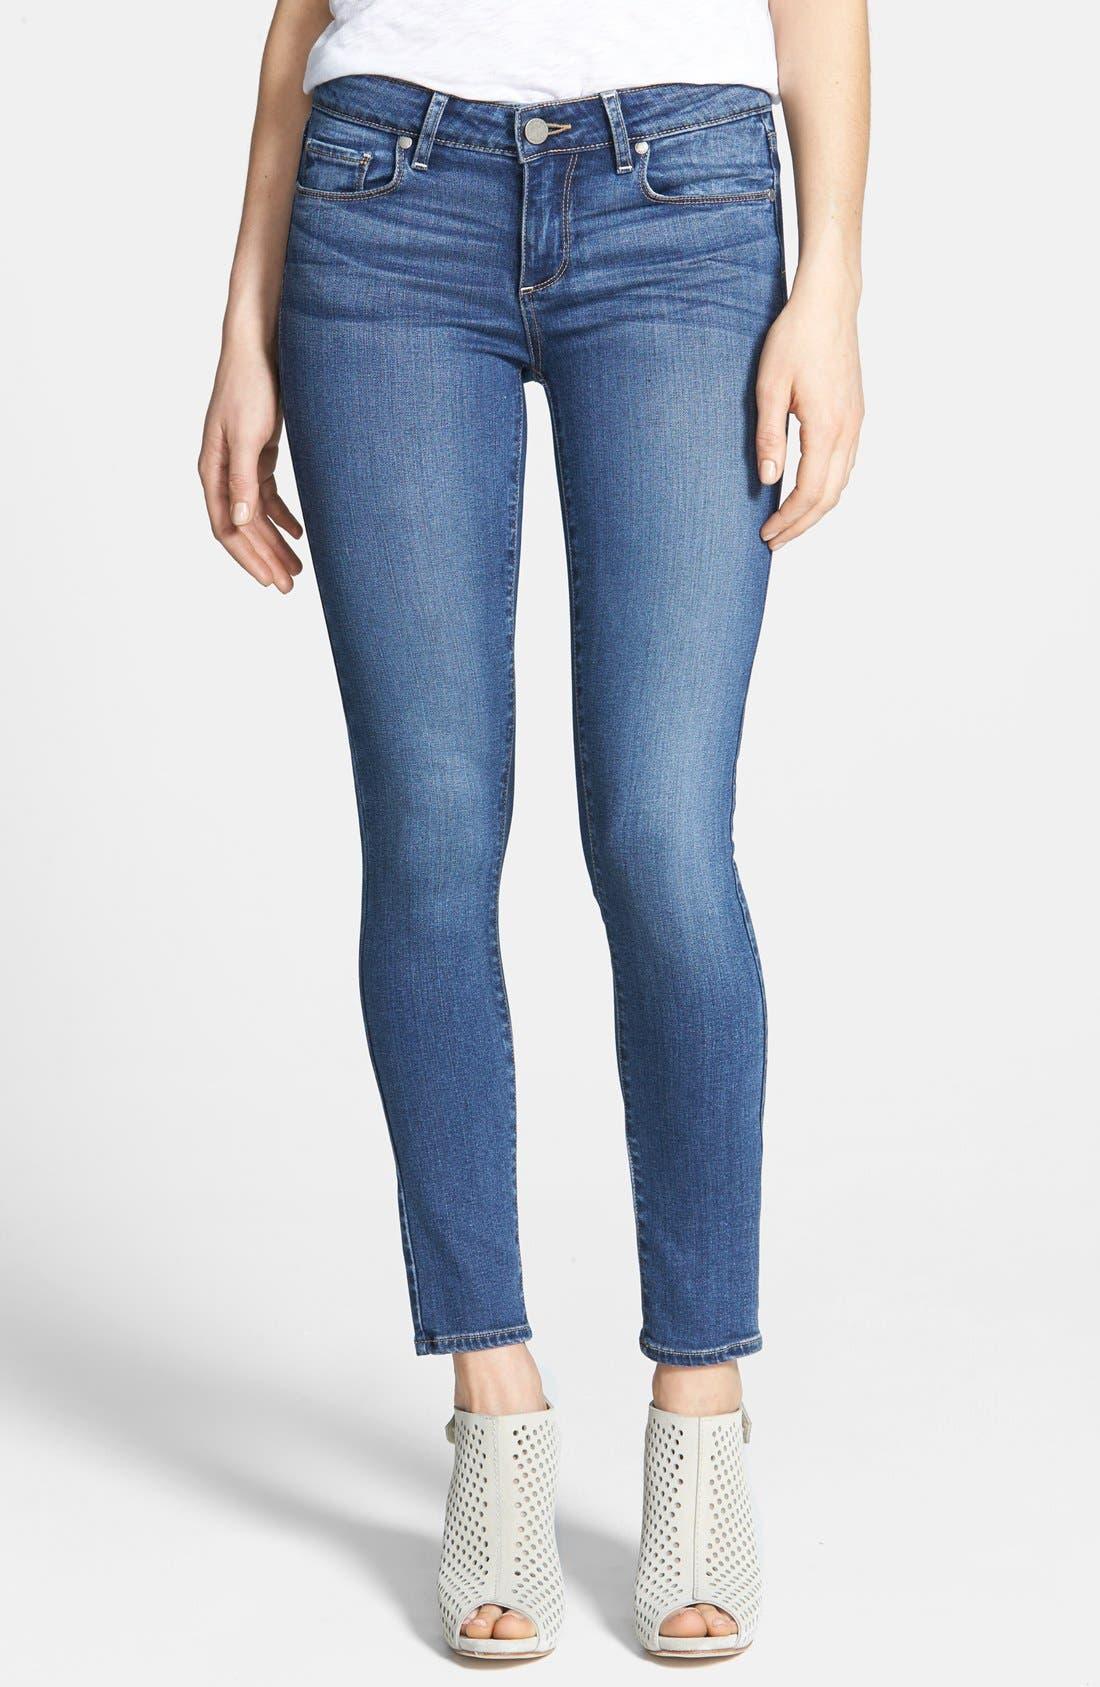 Alternate Image 1 Selected - PAIGE Transcend - Verdugo Ankle Skinny Jeans (Tristan)